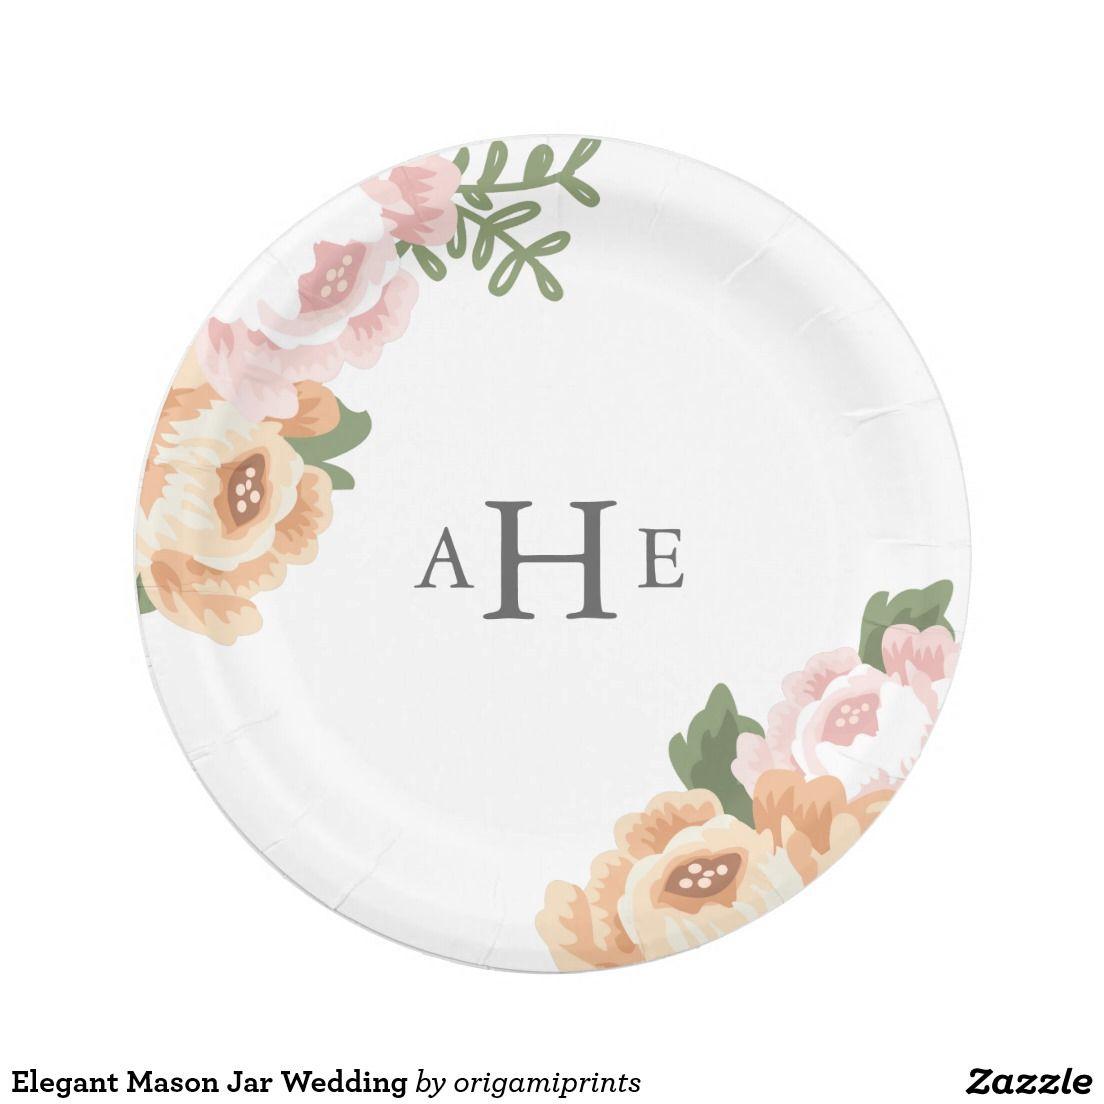 Elegant Mason Jar Wedding Paper Plate  sc 1 st  Pinterest & Elegant Mason Jar Wedding Paper Plate | Wedding and Engagement ...